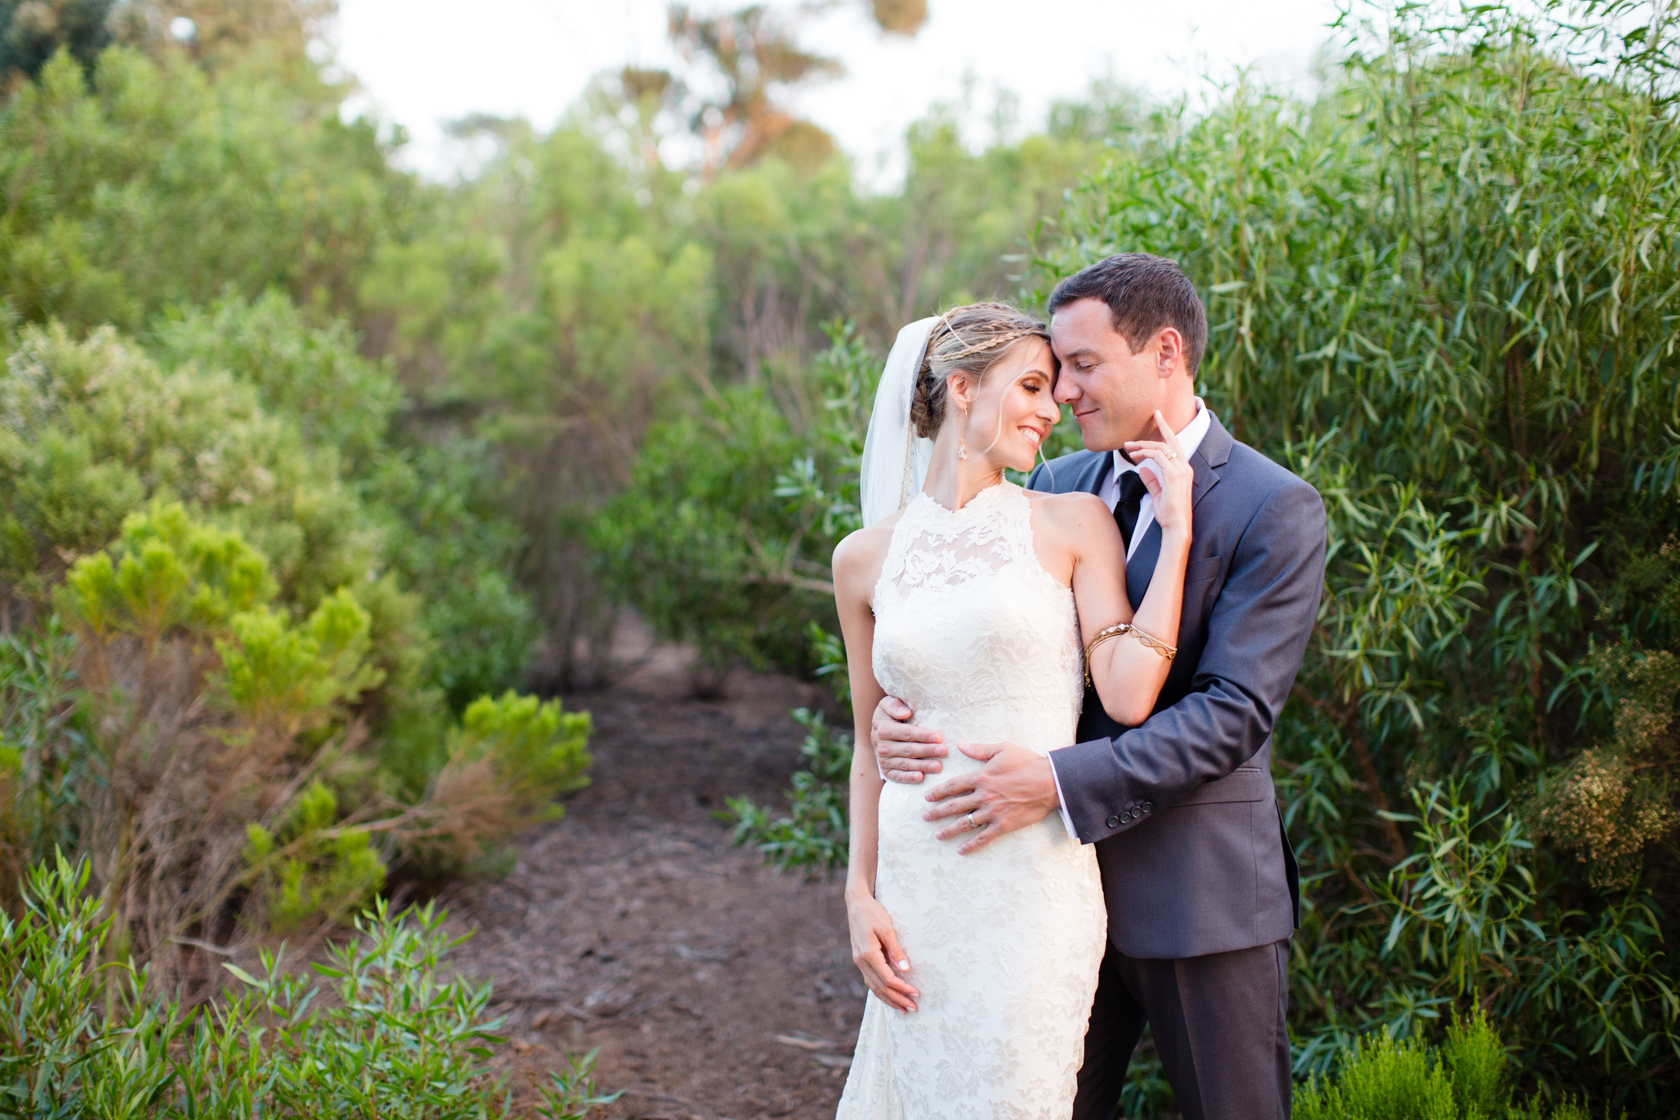 the_lodge_at_torrey_pines_wedding_078.jpg